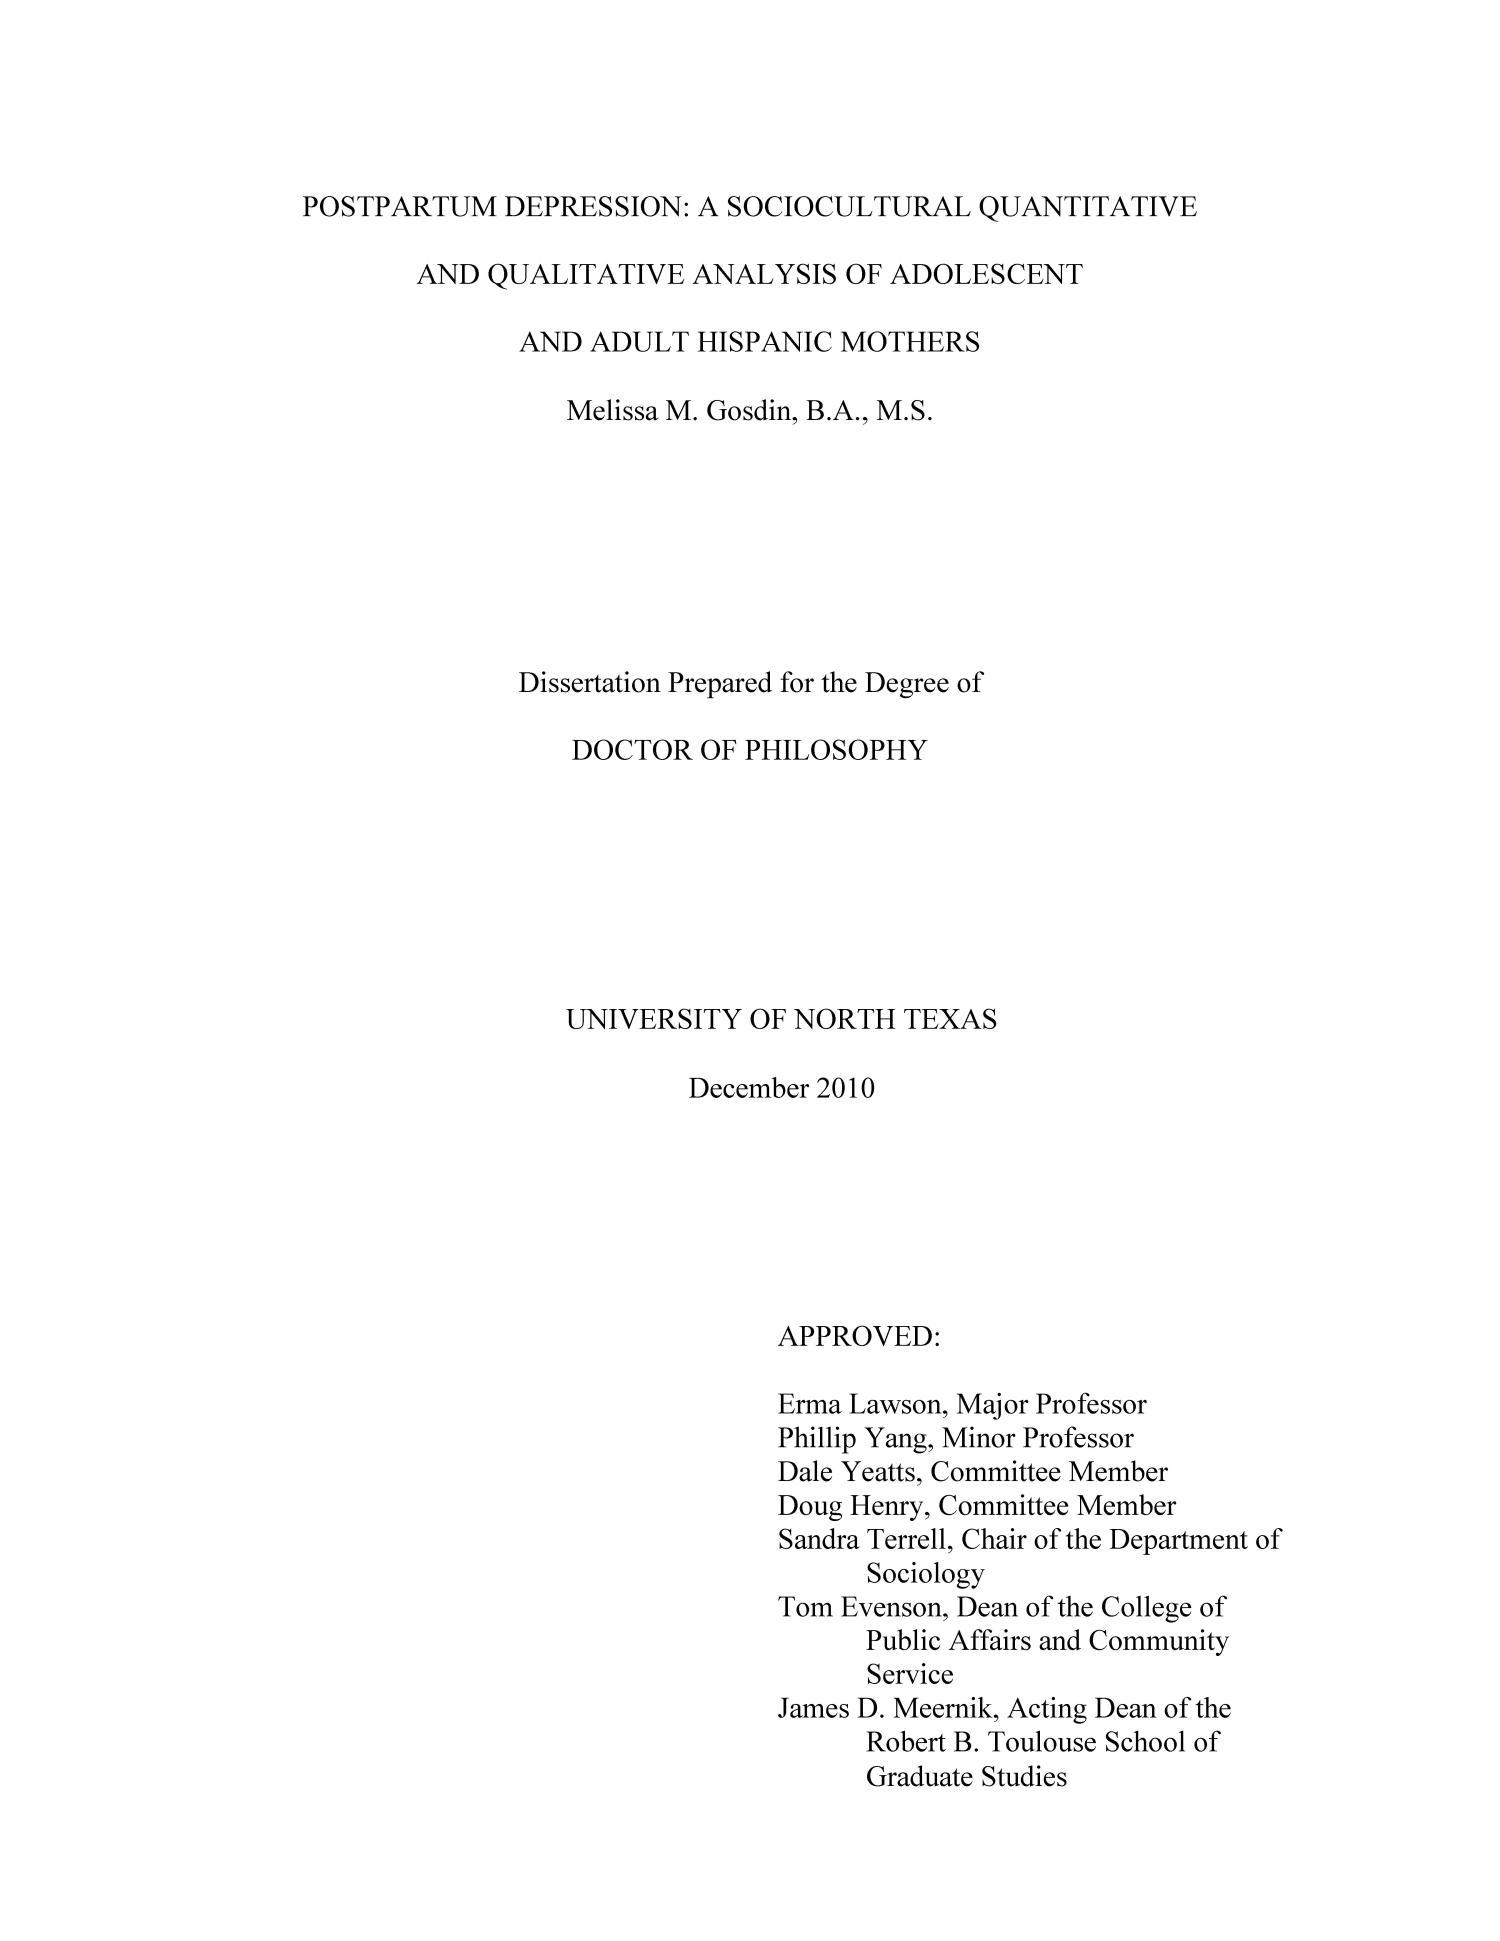 melissa gosdin dissertation